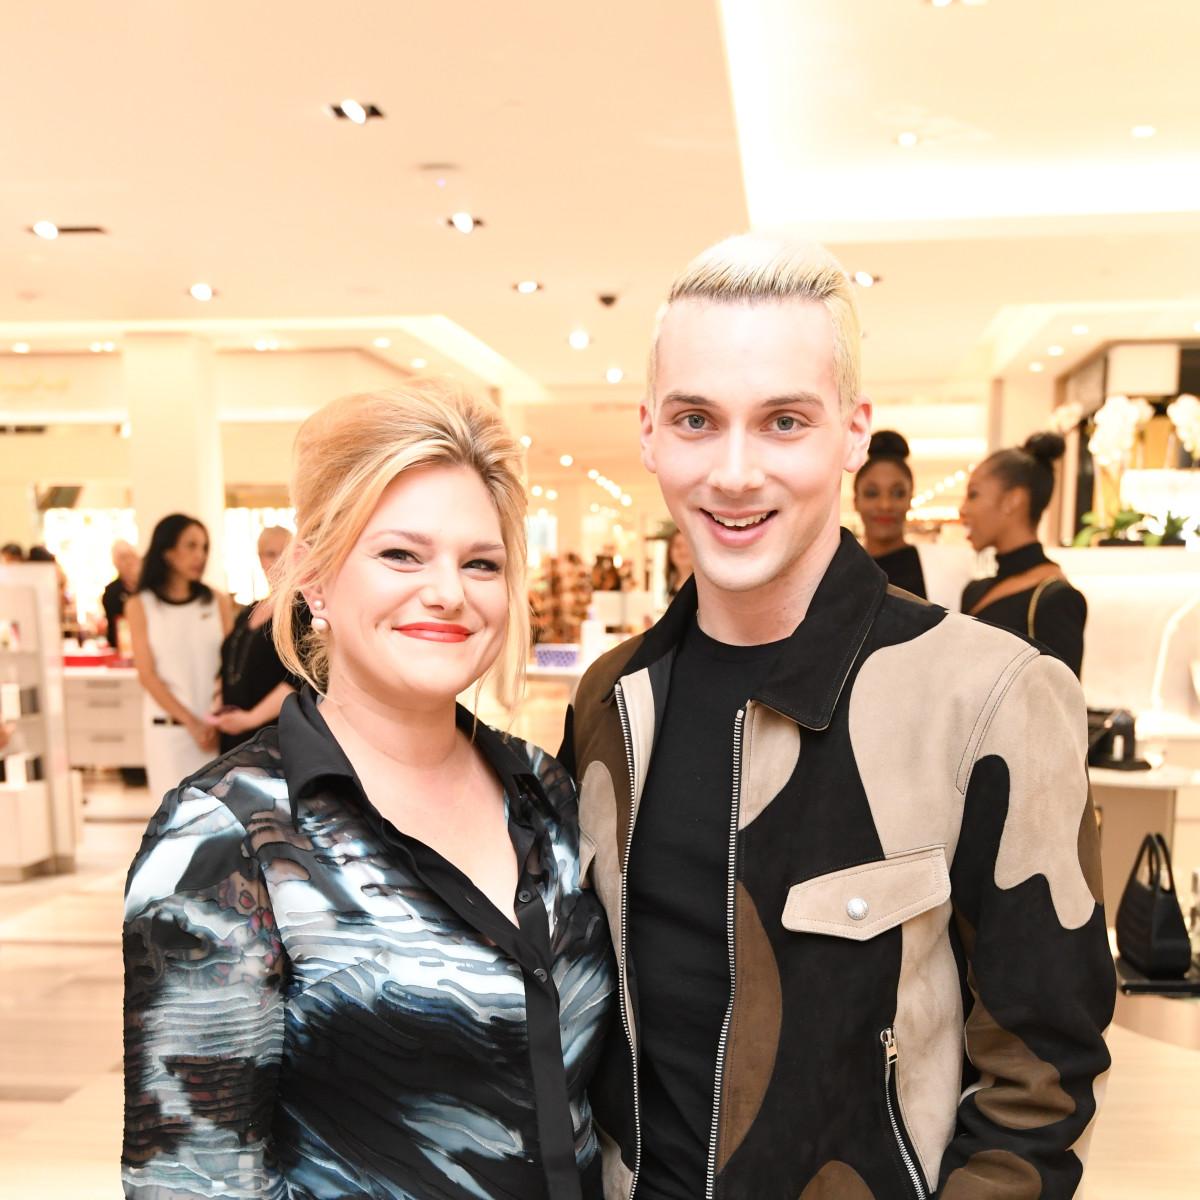 Heart of Fashion, Clive Christian Event, 6/16  Aubrey Layne, Jonathan Blake